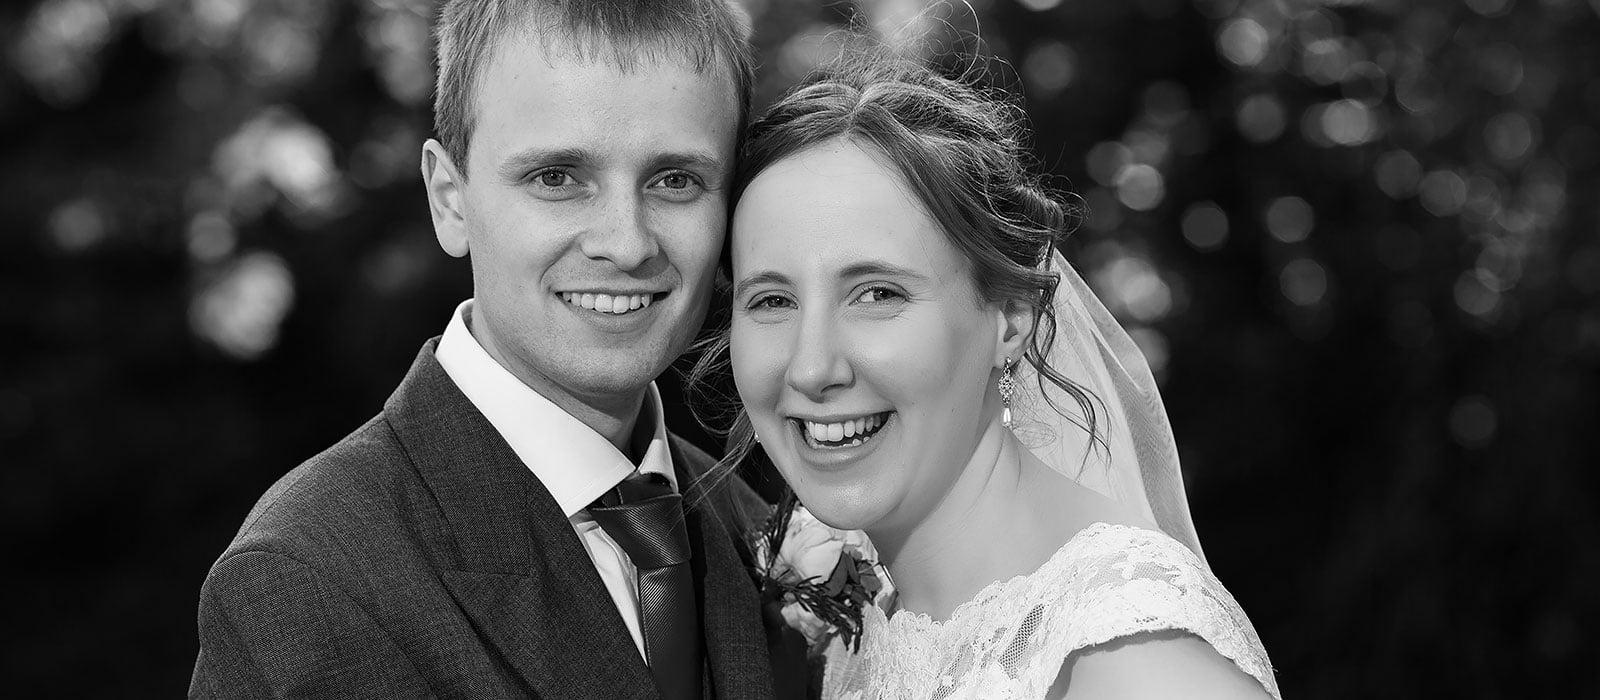 Guildford Cathedral wedding | Charlotte & Tom